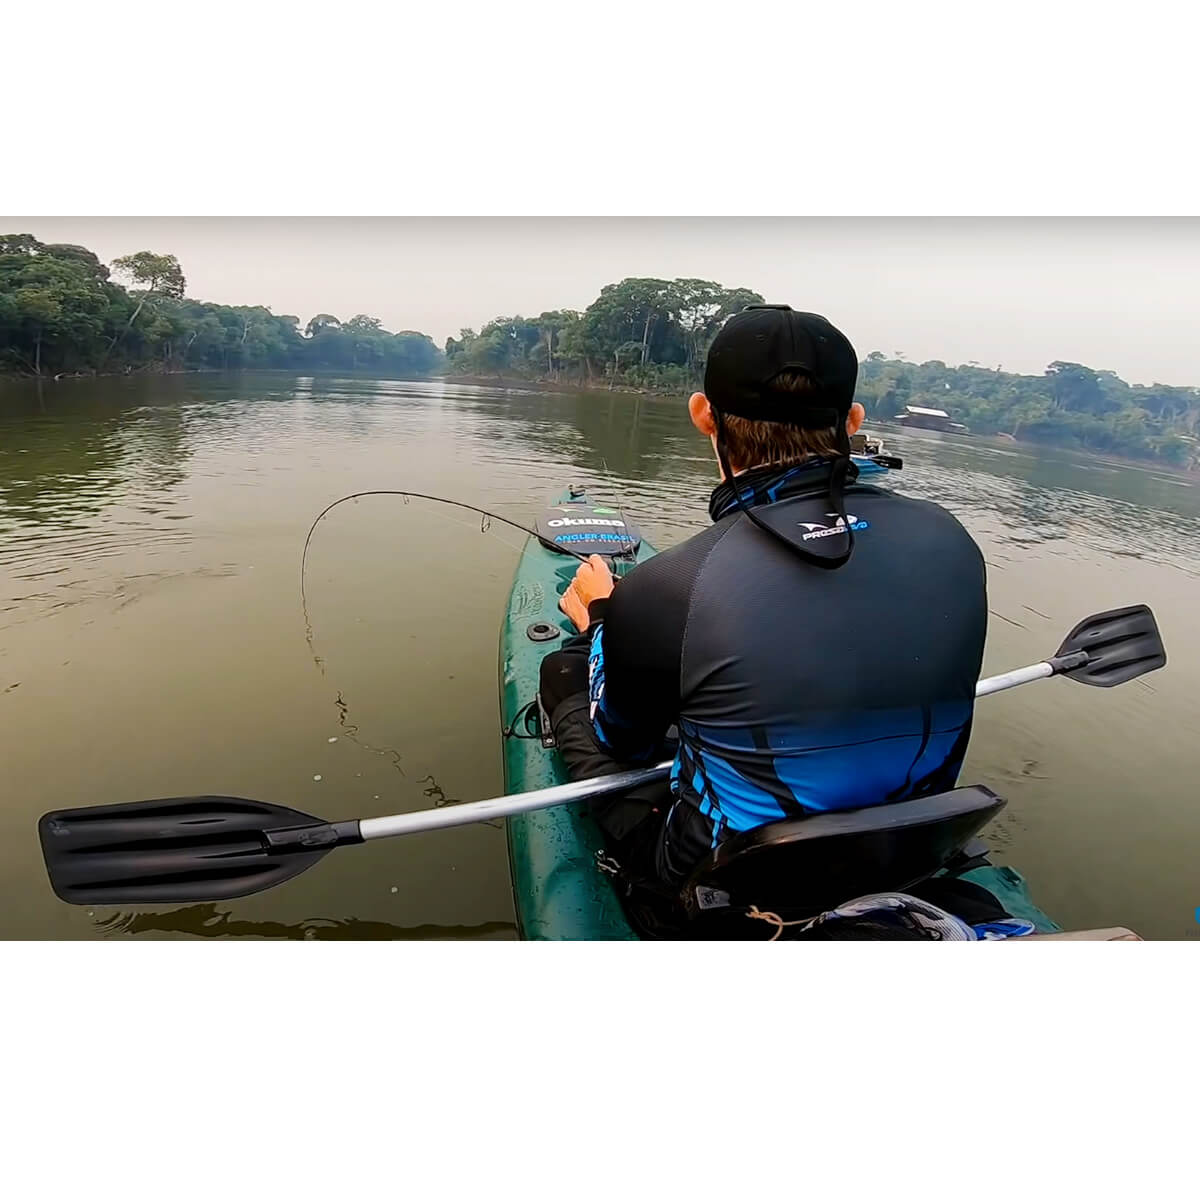 CAIAQUE BARRACUDA PRO FISH LONTRAS COMPLETO COM ASSENTO ELEVADO